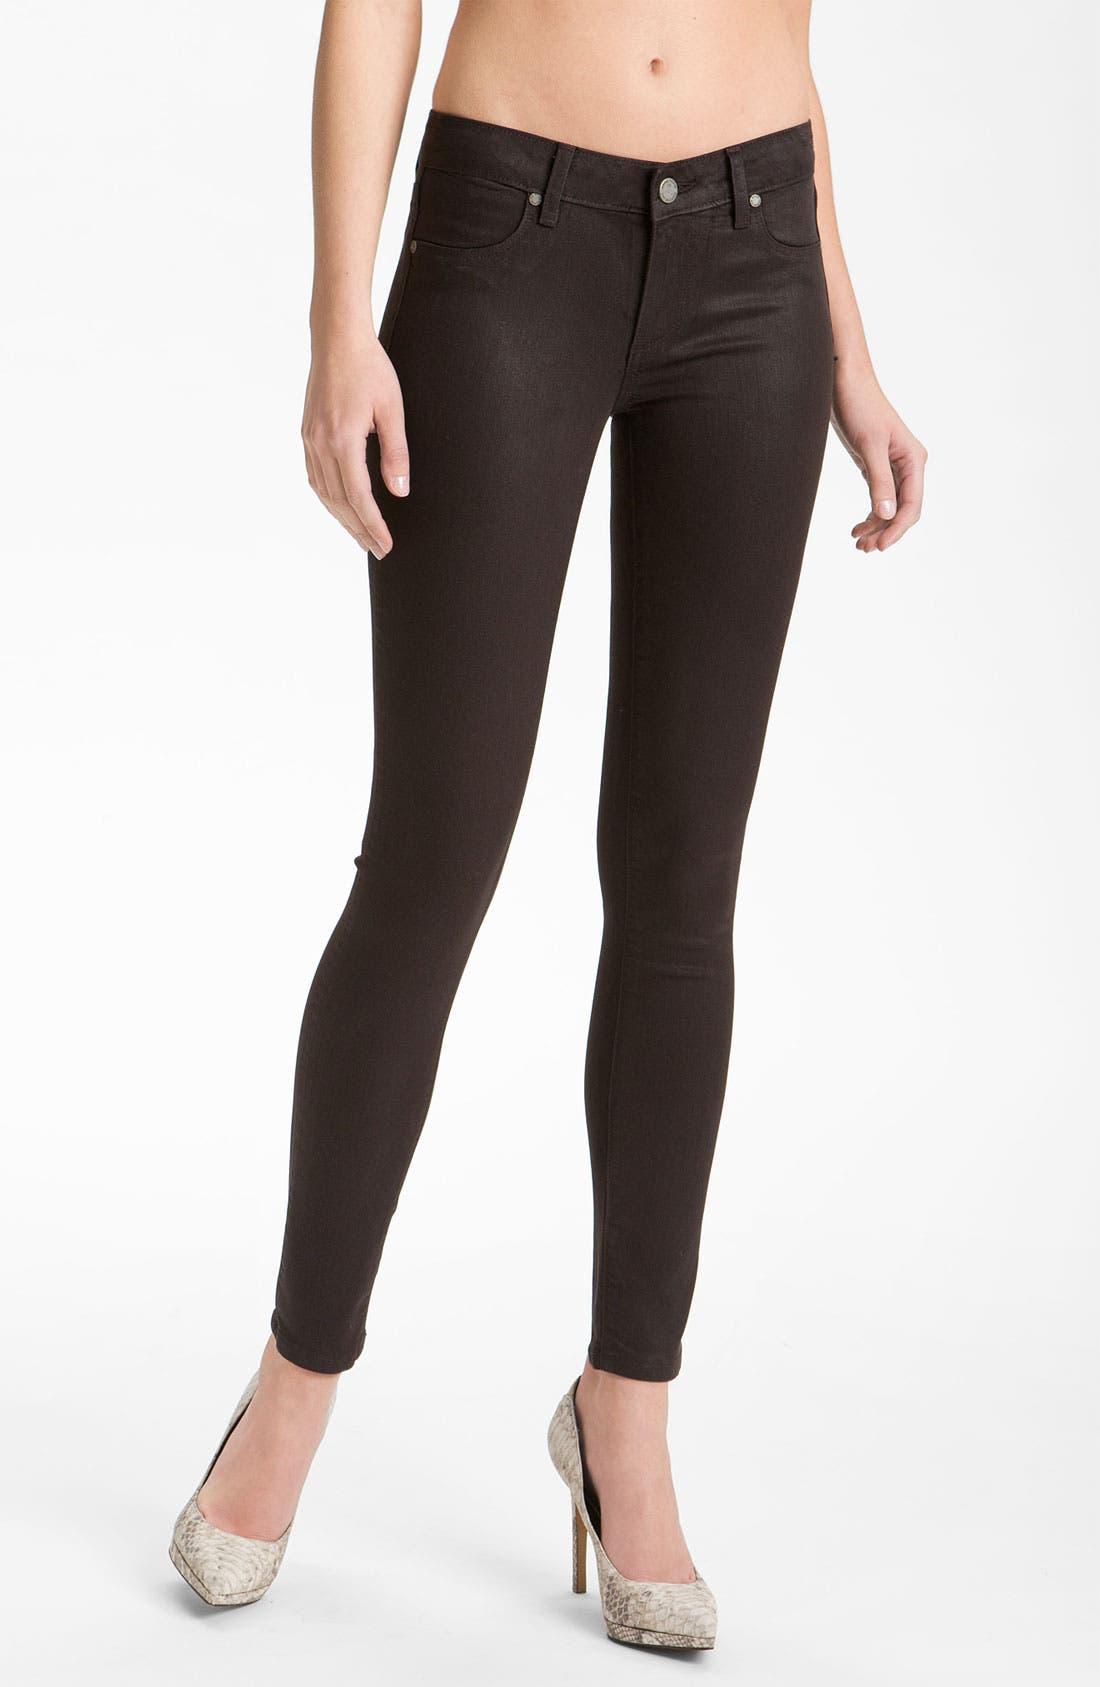 Alternate Image 1 Selected - Paige Denim 'Verdugo' Coated Skinny Jeans (Java)